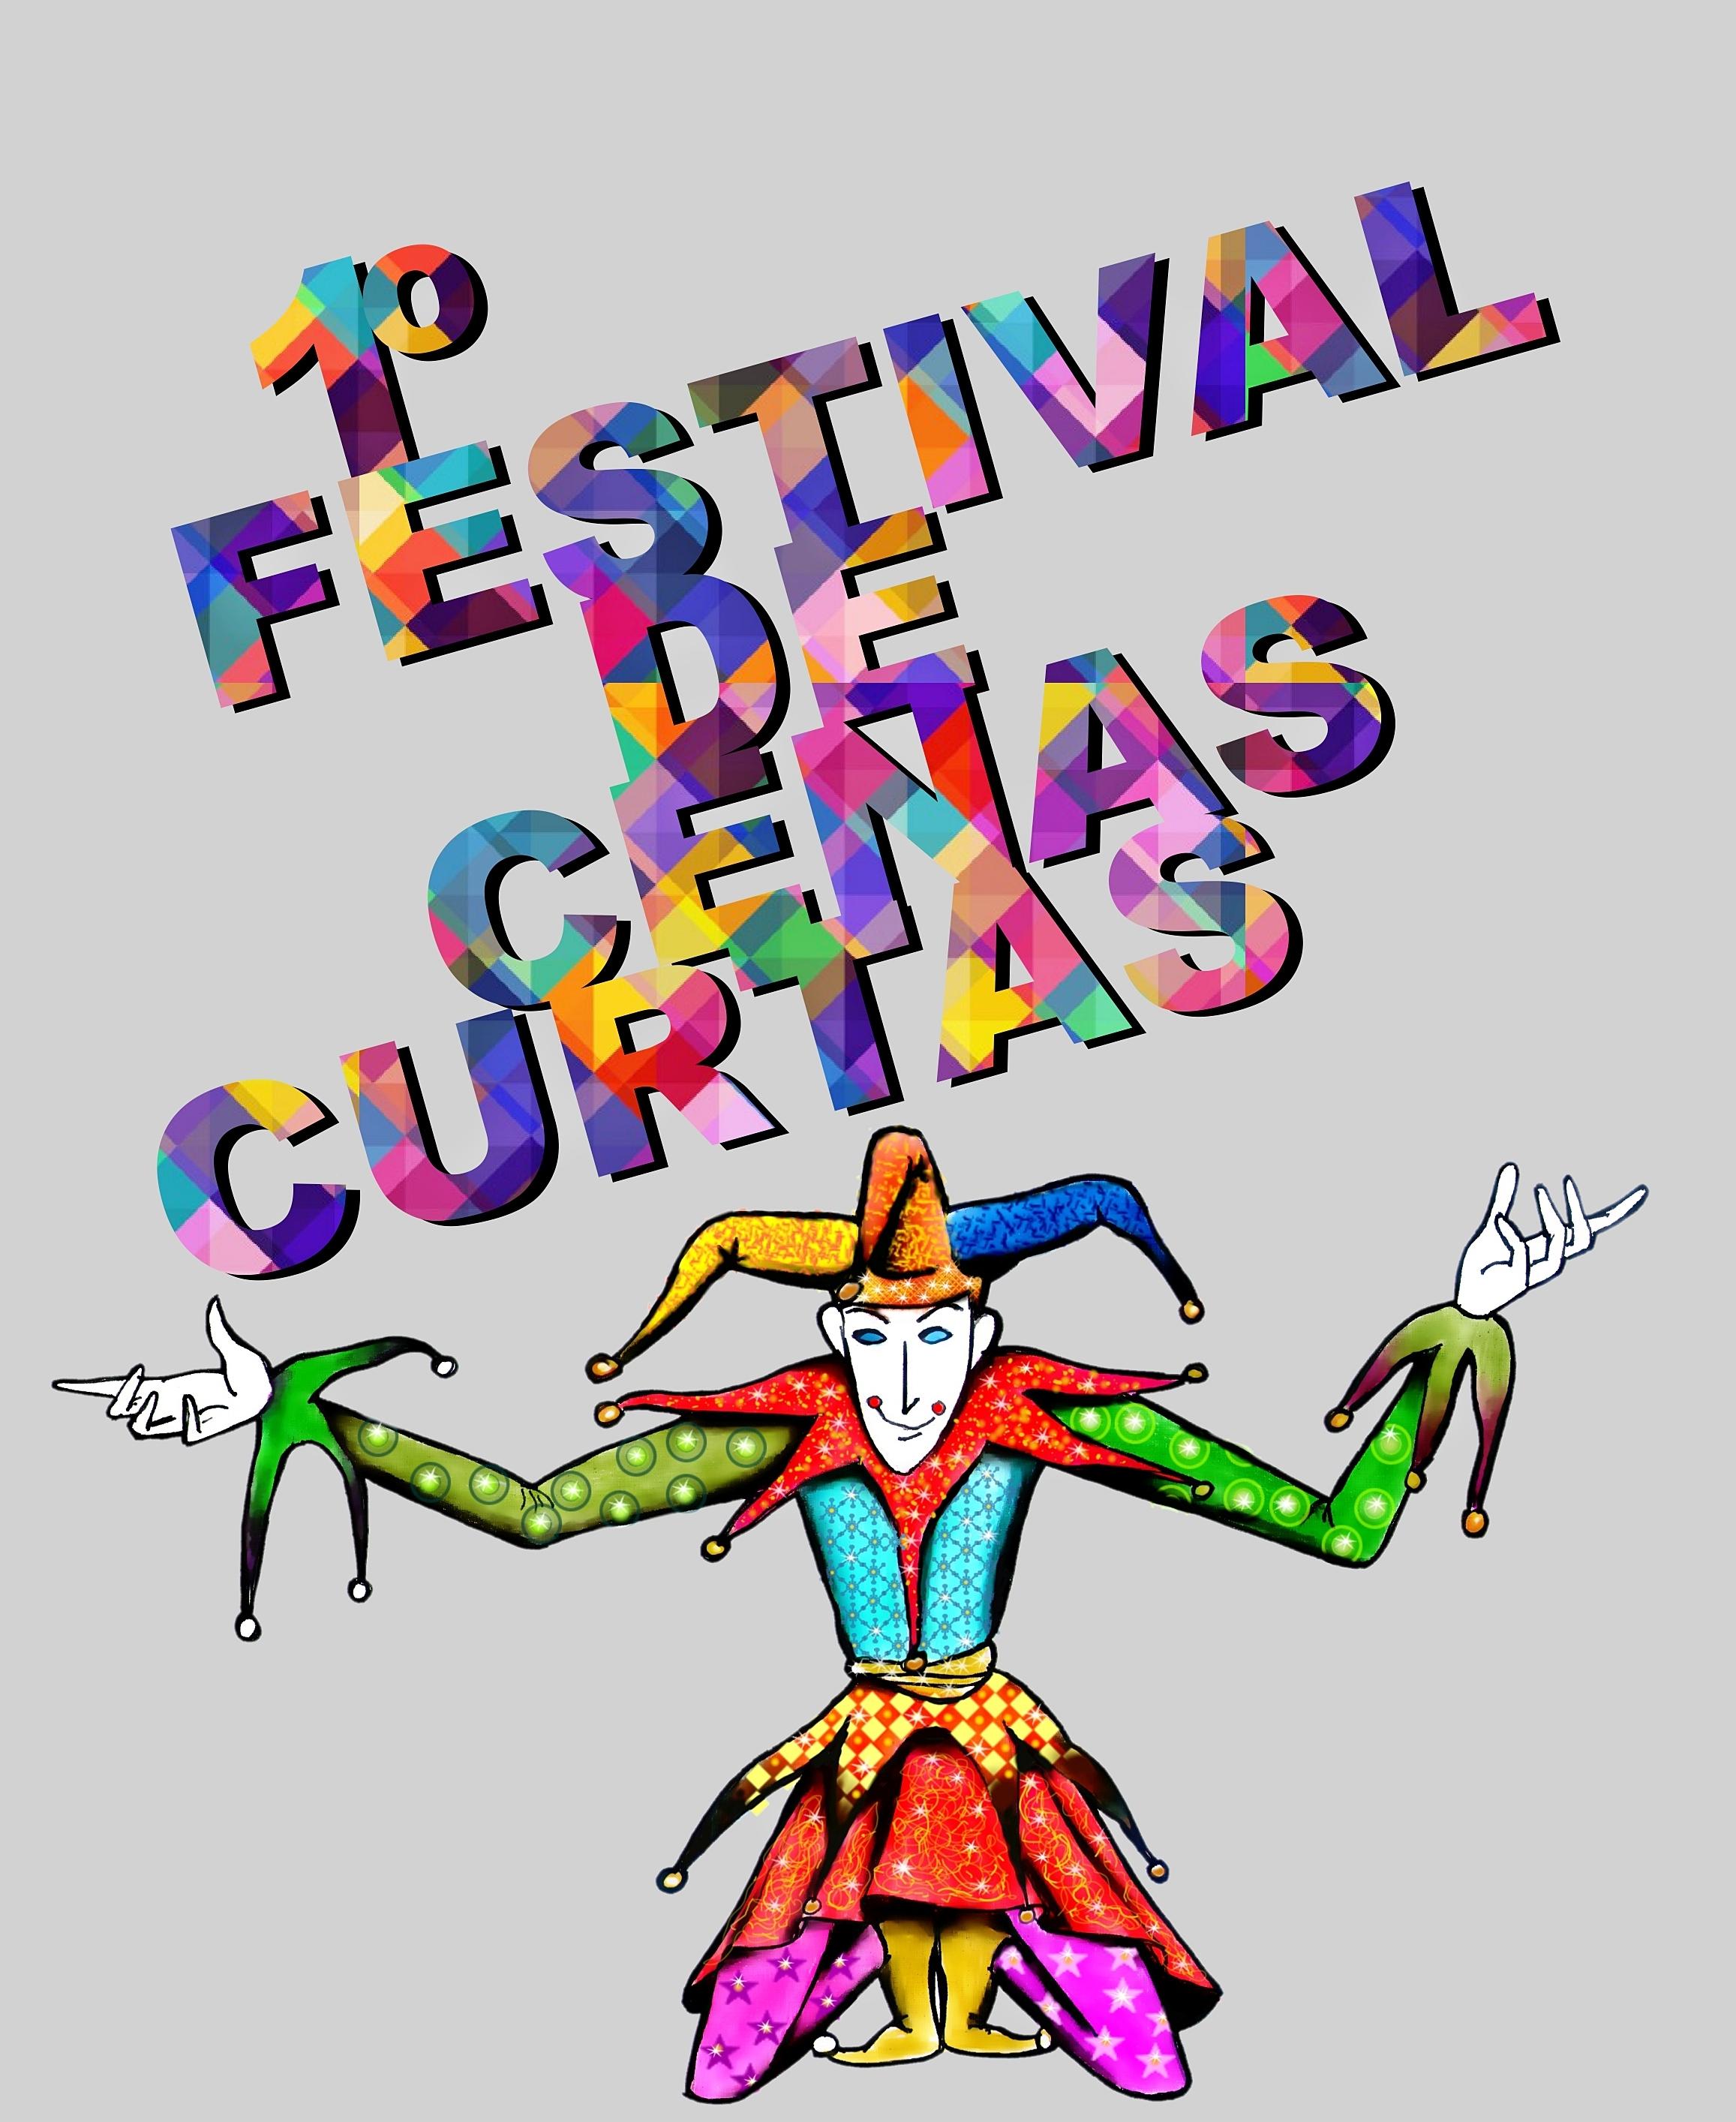 Cenas_Curtas-ilustracao